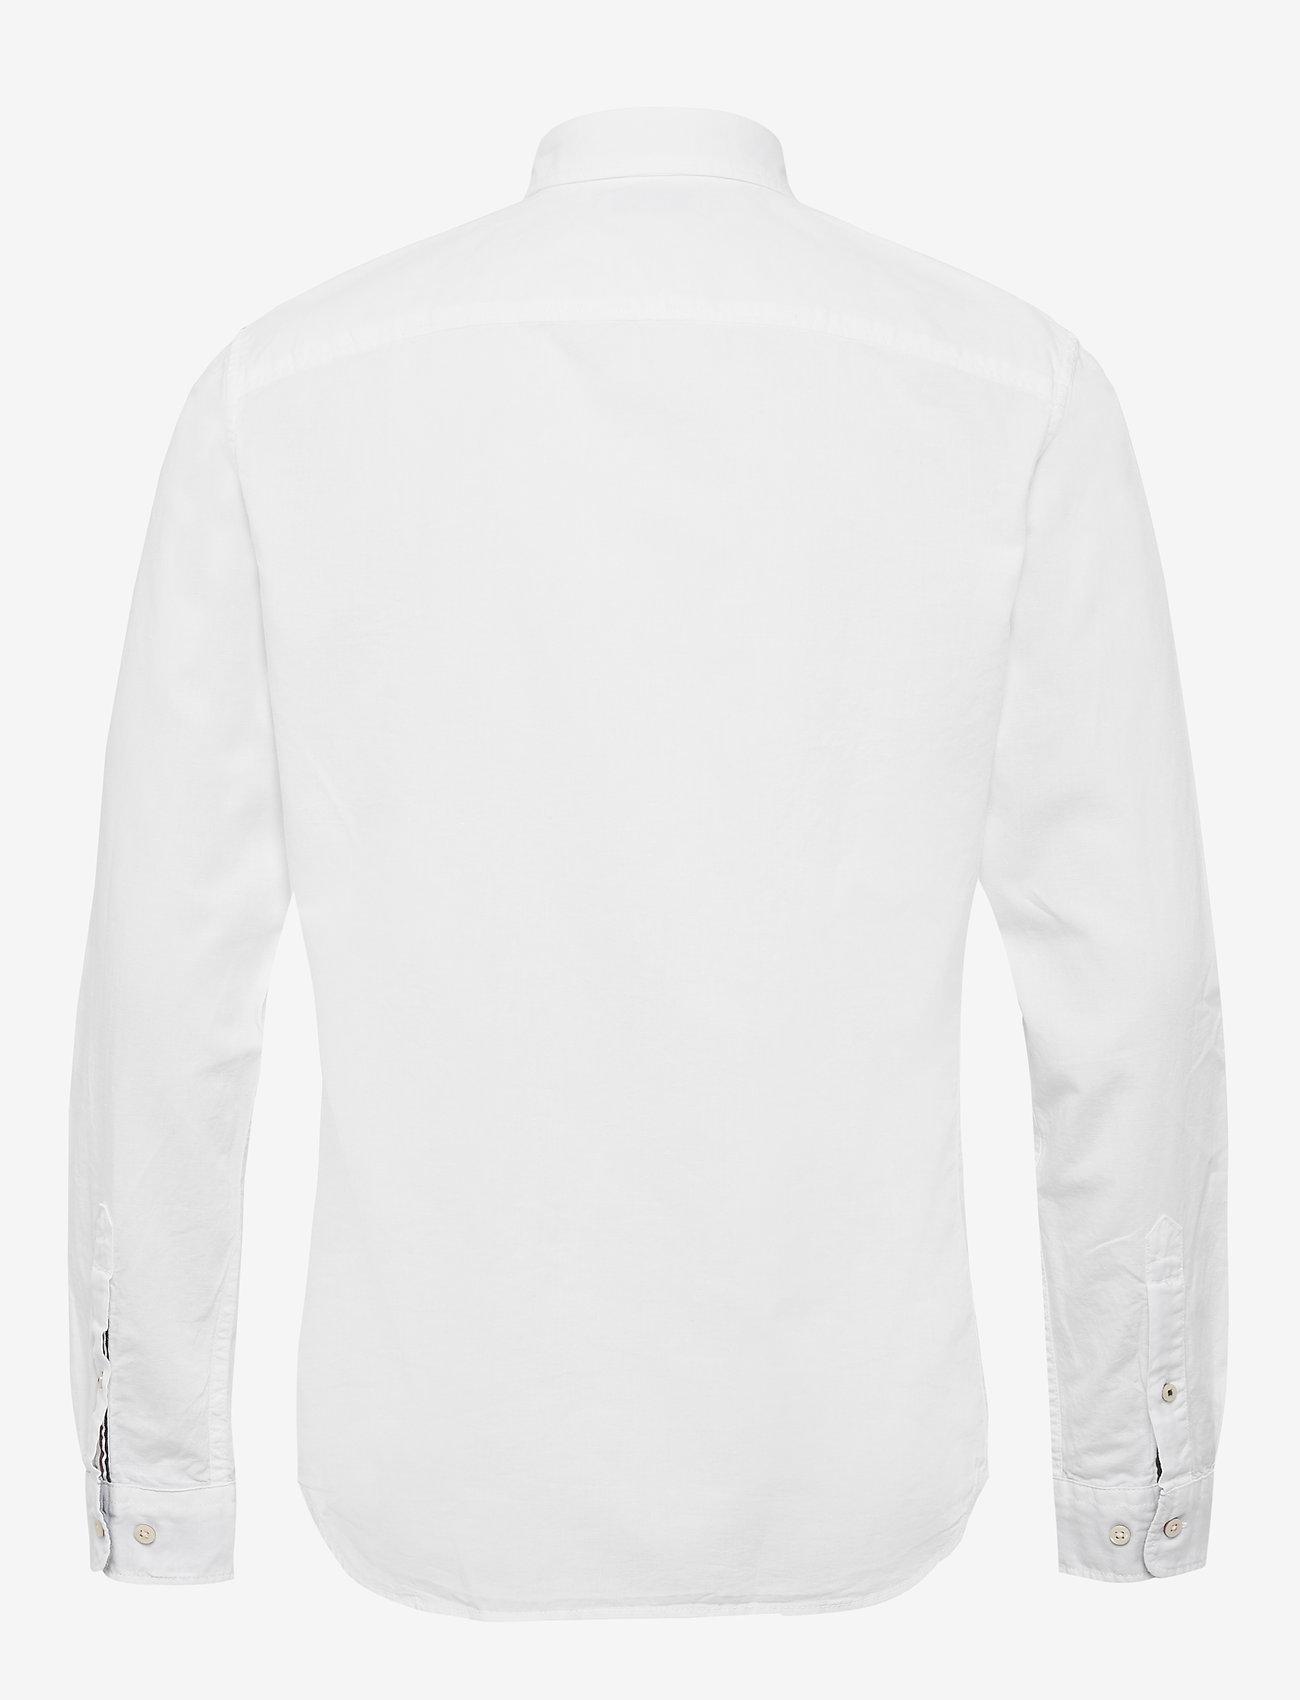 Jack & Jones - JJESUMMER SHIRT L/S S21 STS - basic skjortor - white - 1